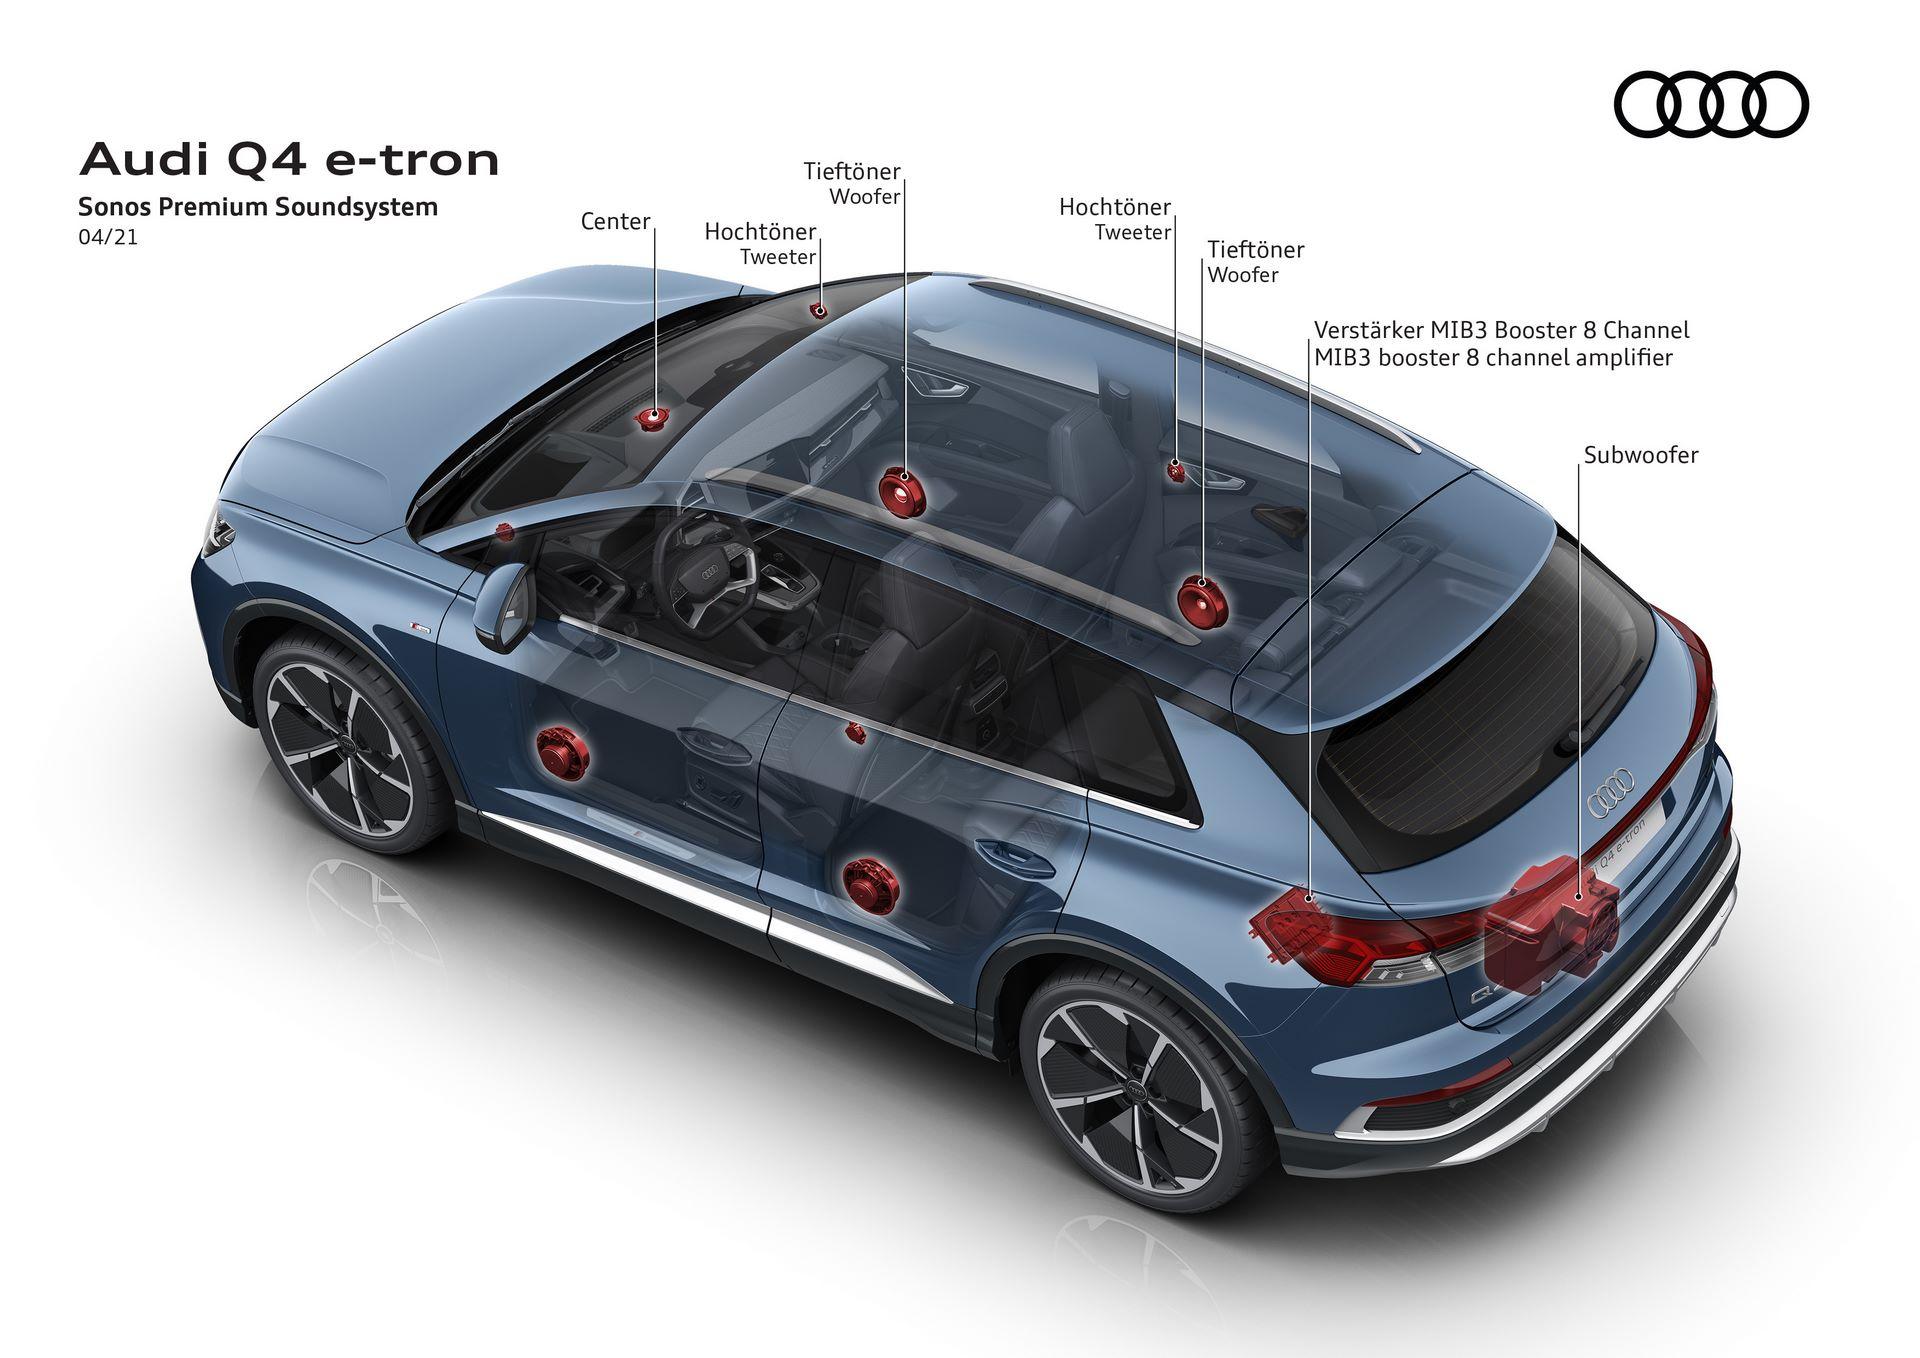 Audi-Q4-e-tron-and-Q4-e-tron-Sportback-102